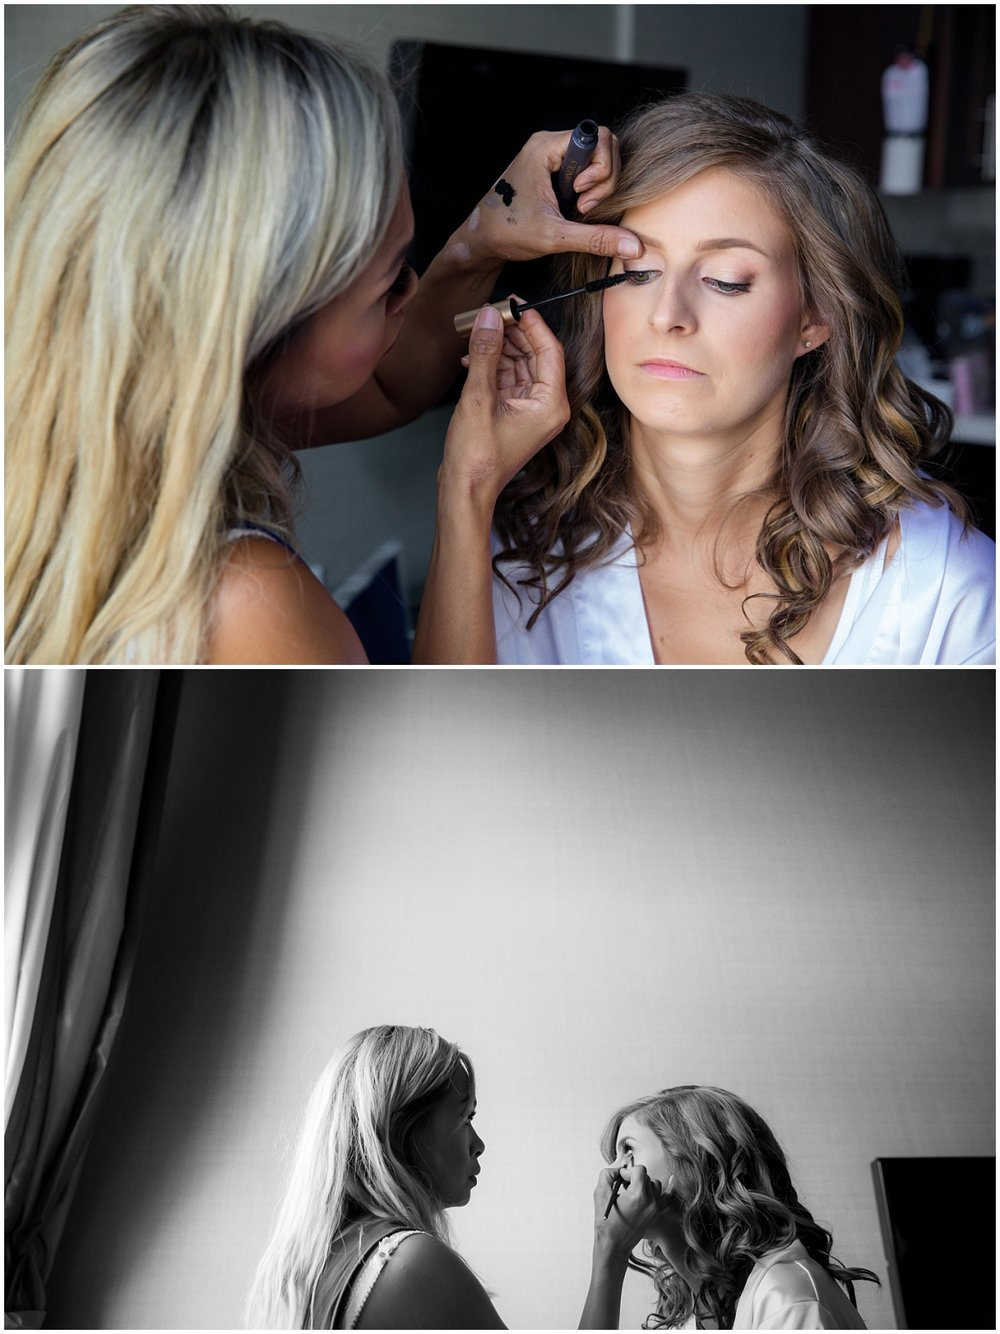 Amazing Day Photography - Redwoods Golf Course Wedding - Amanda and Dustin - Langley Wedding Photographer  (3).jpg